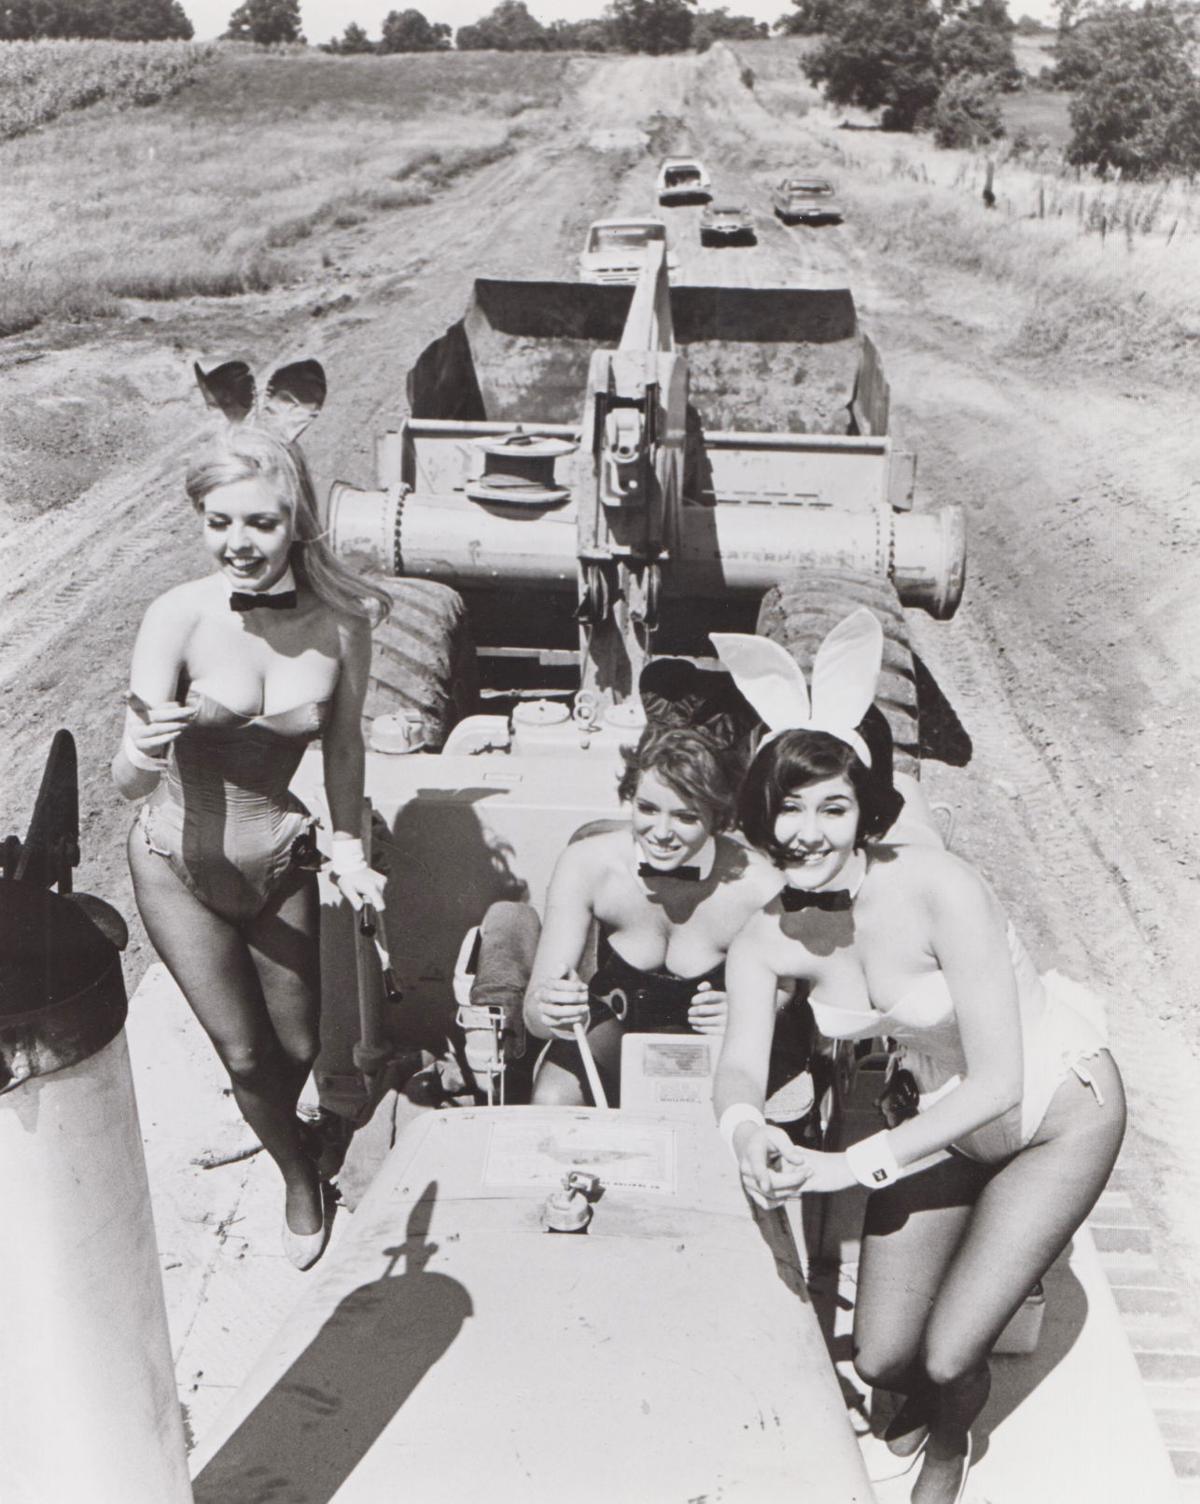 Playboy Club bunnies on construction equipment